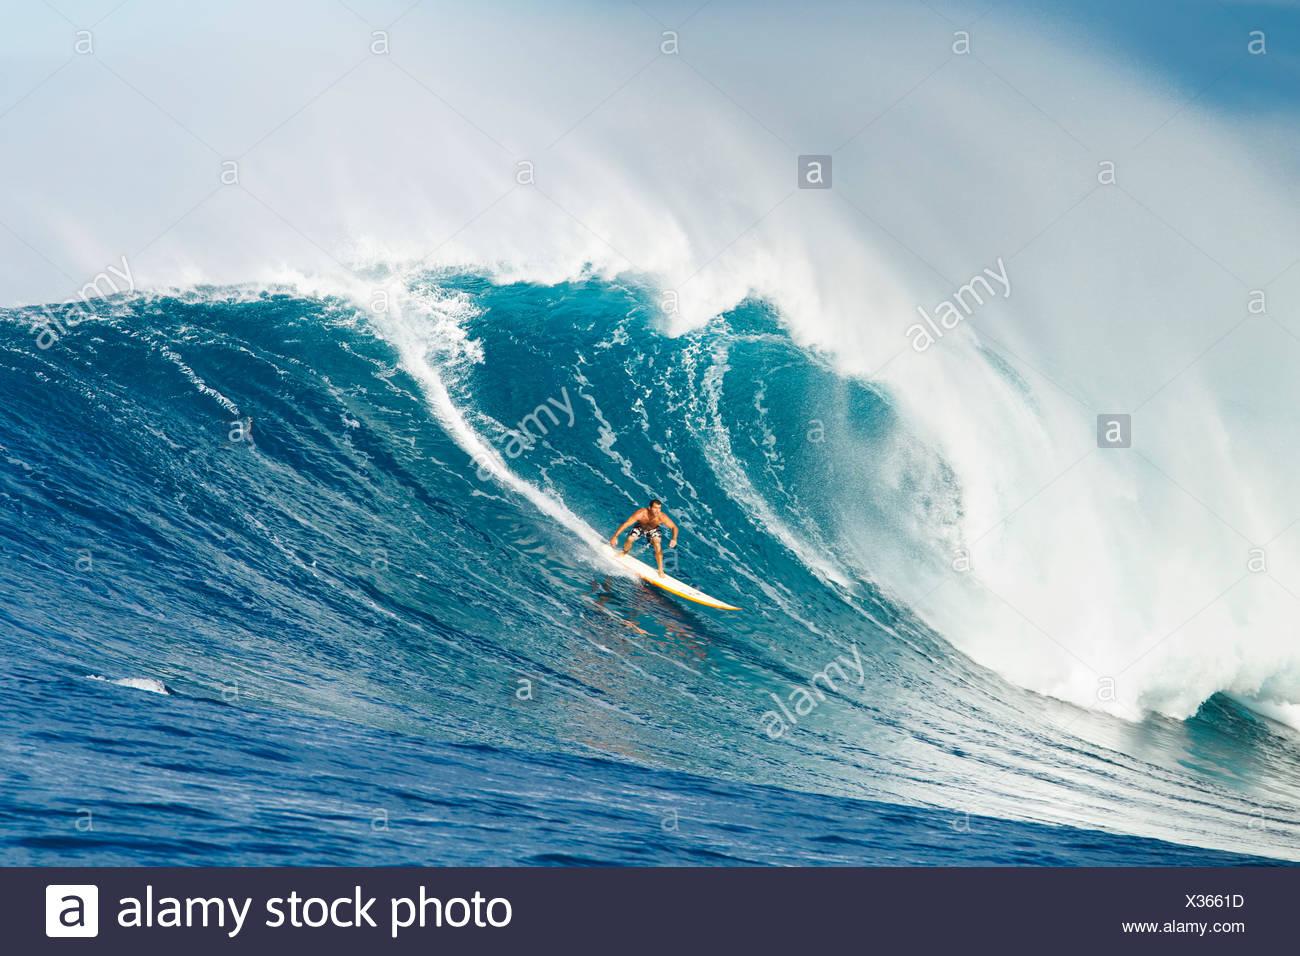 Hawaii Maui Peahi Surfer Rides A Giant Wave At Peahi Also